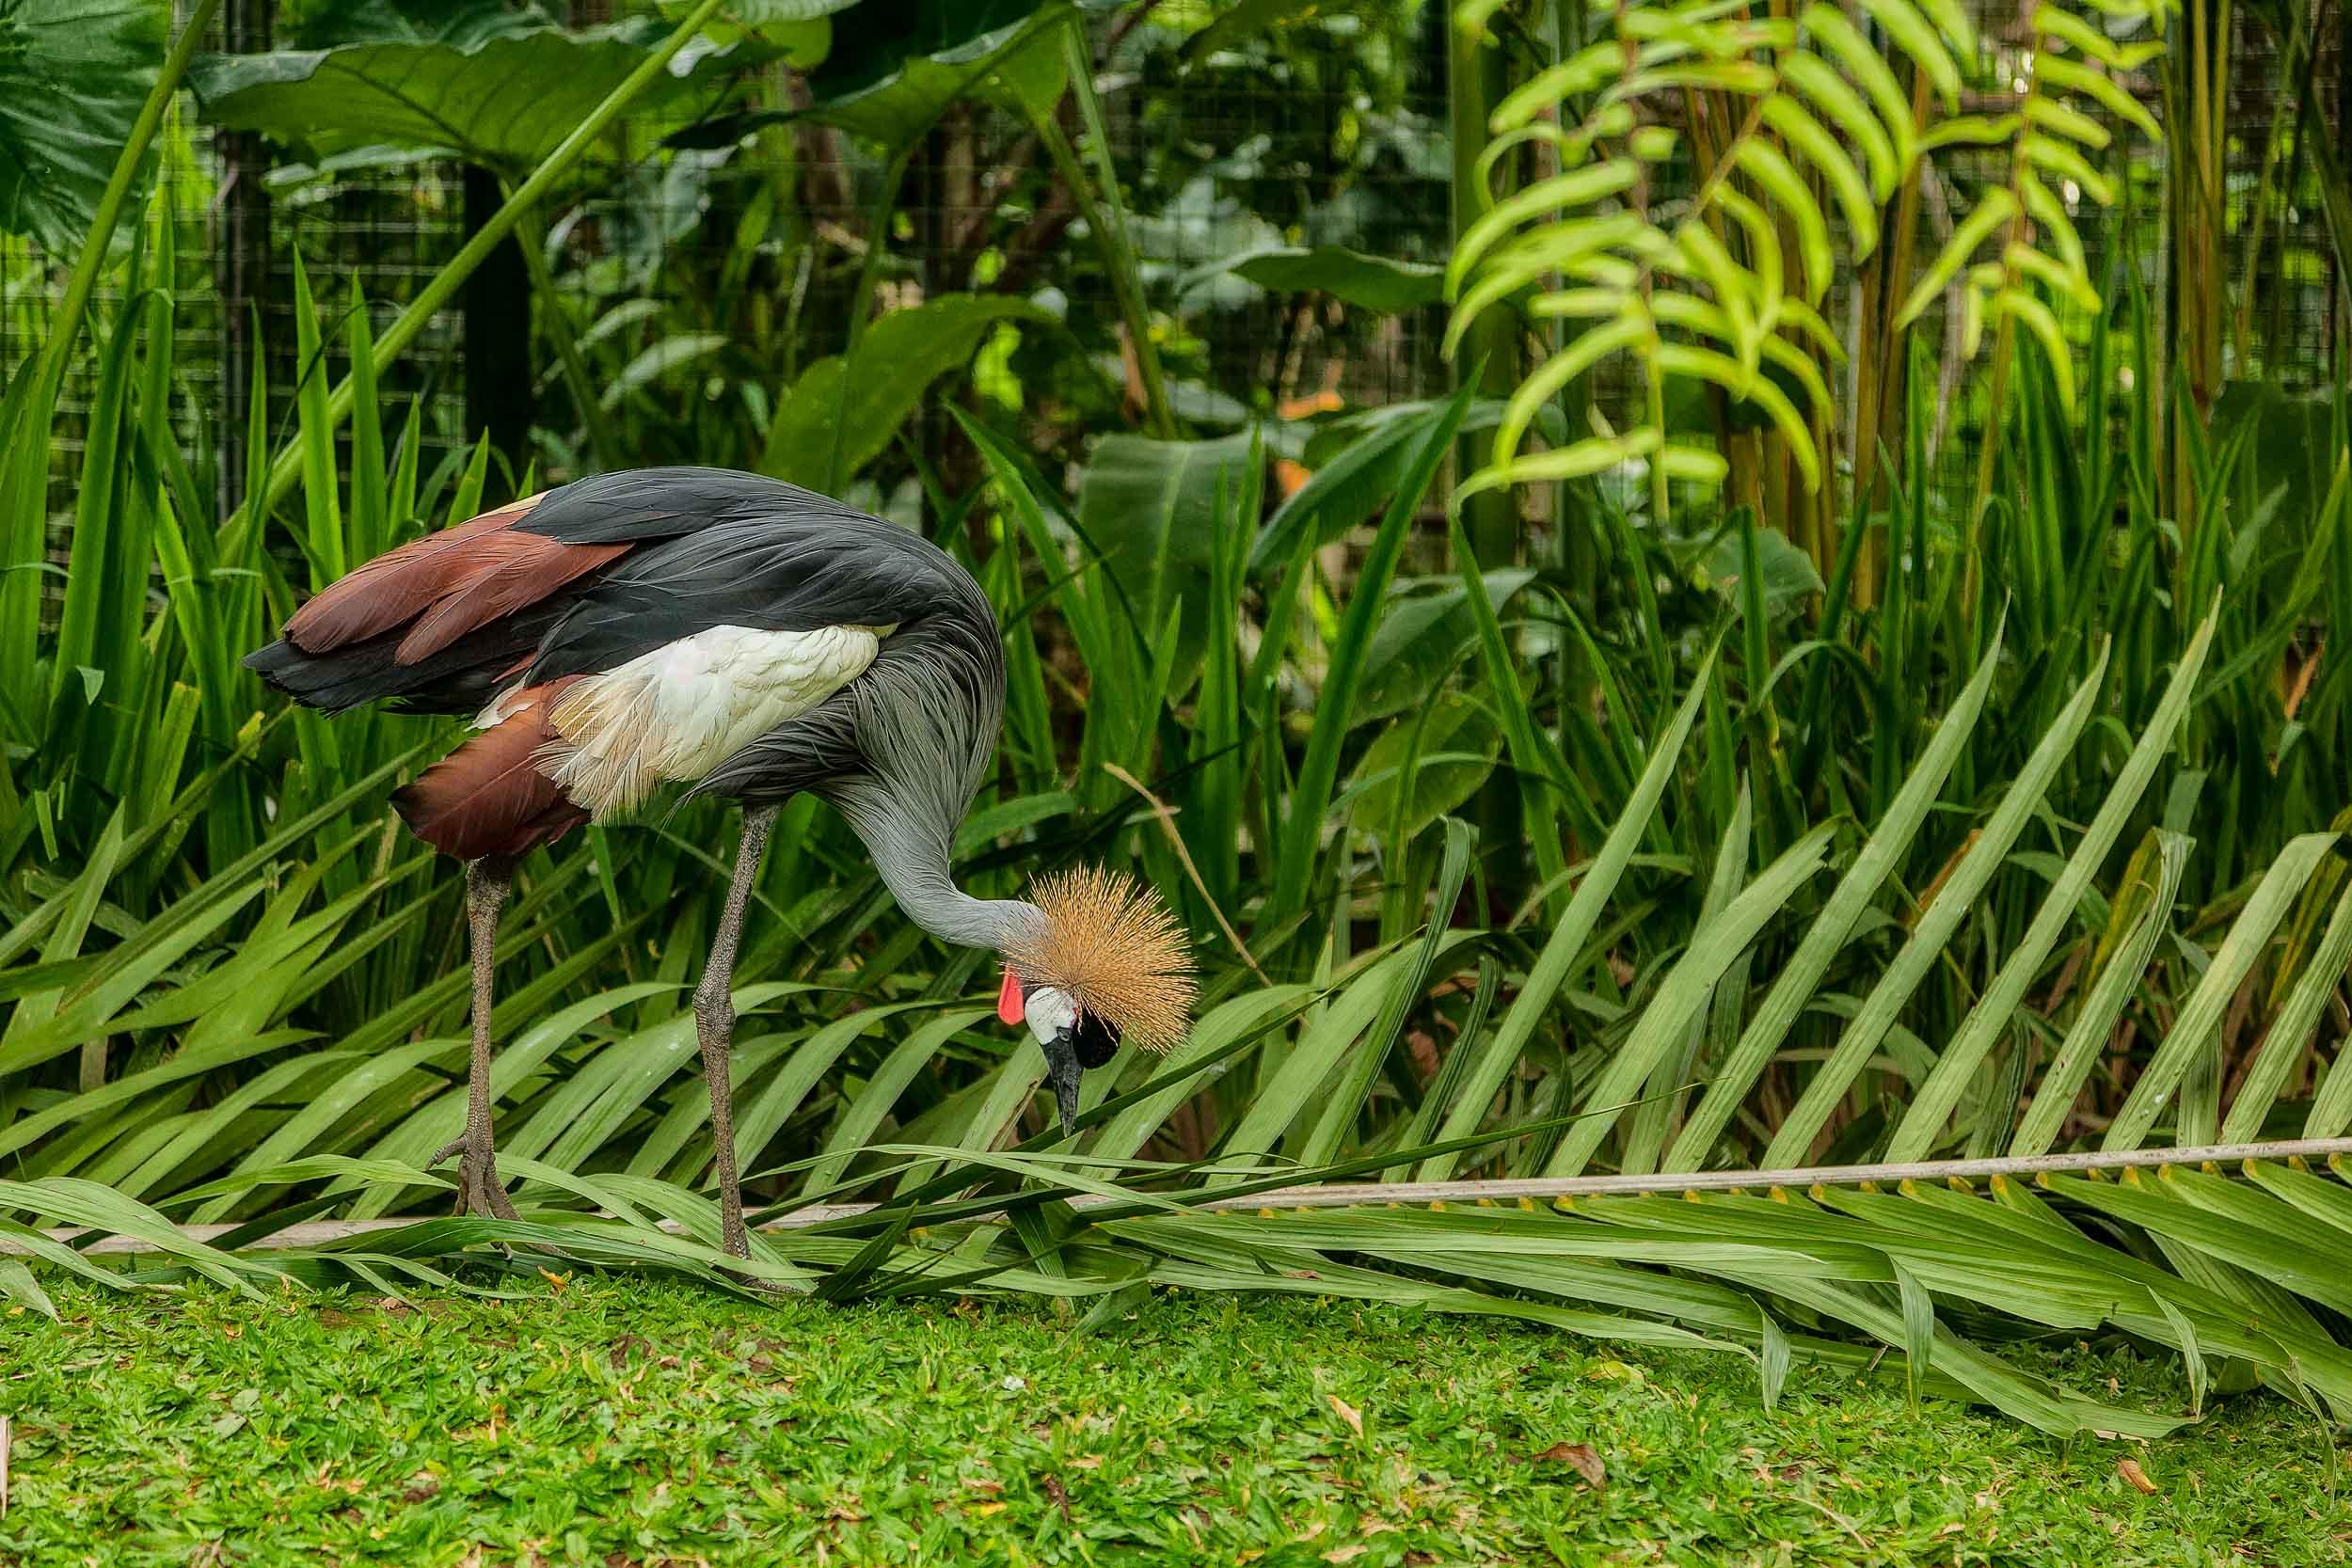 A colorful bird feeding at the    Bali Zoo    near Ubud in    Bali, Indonesia   .